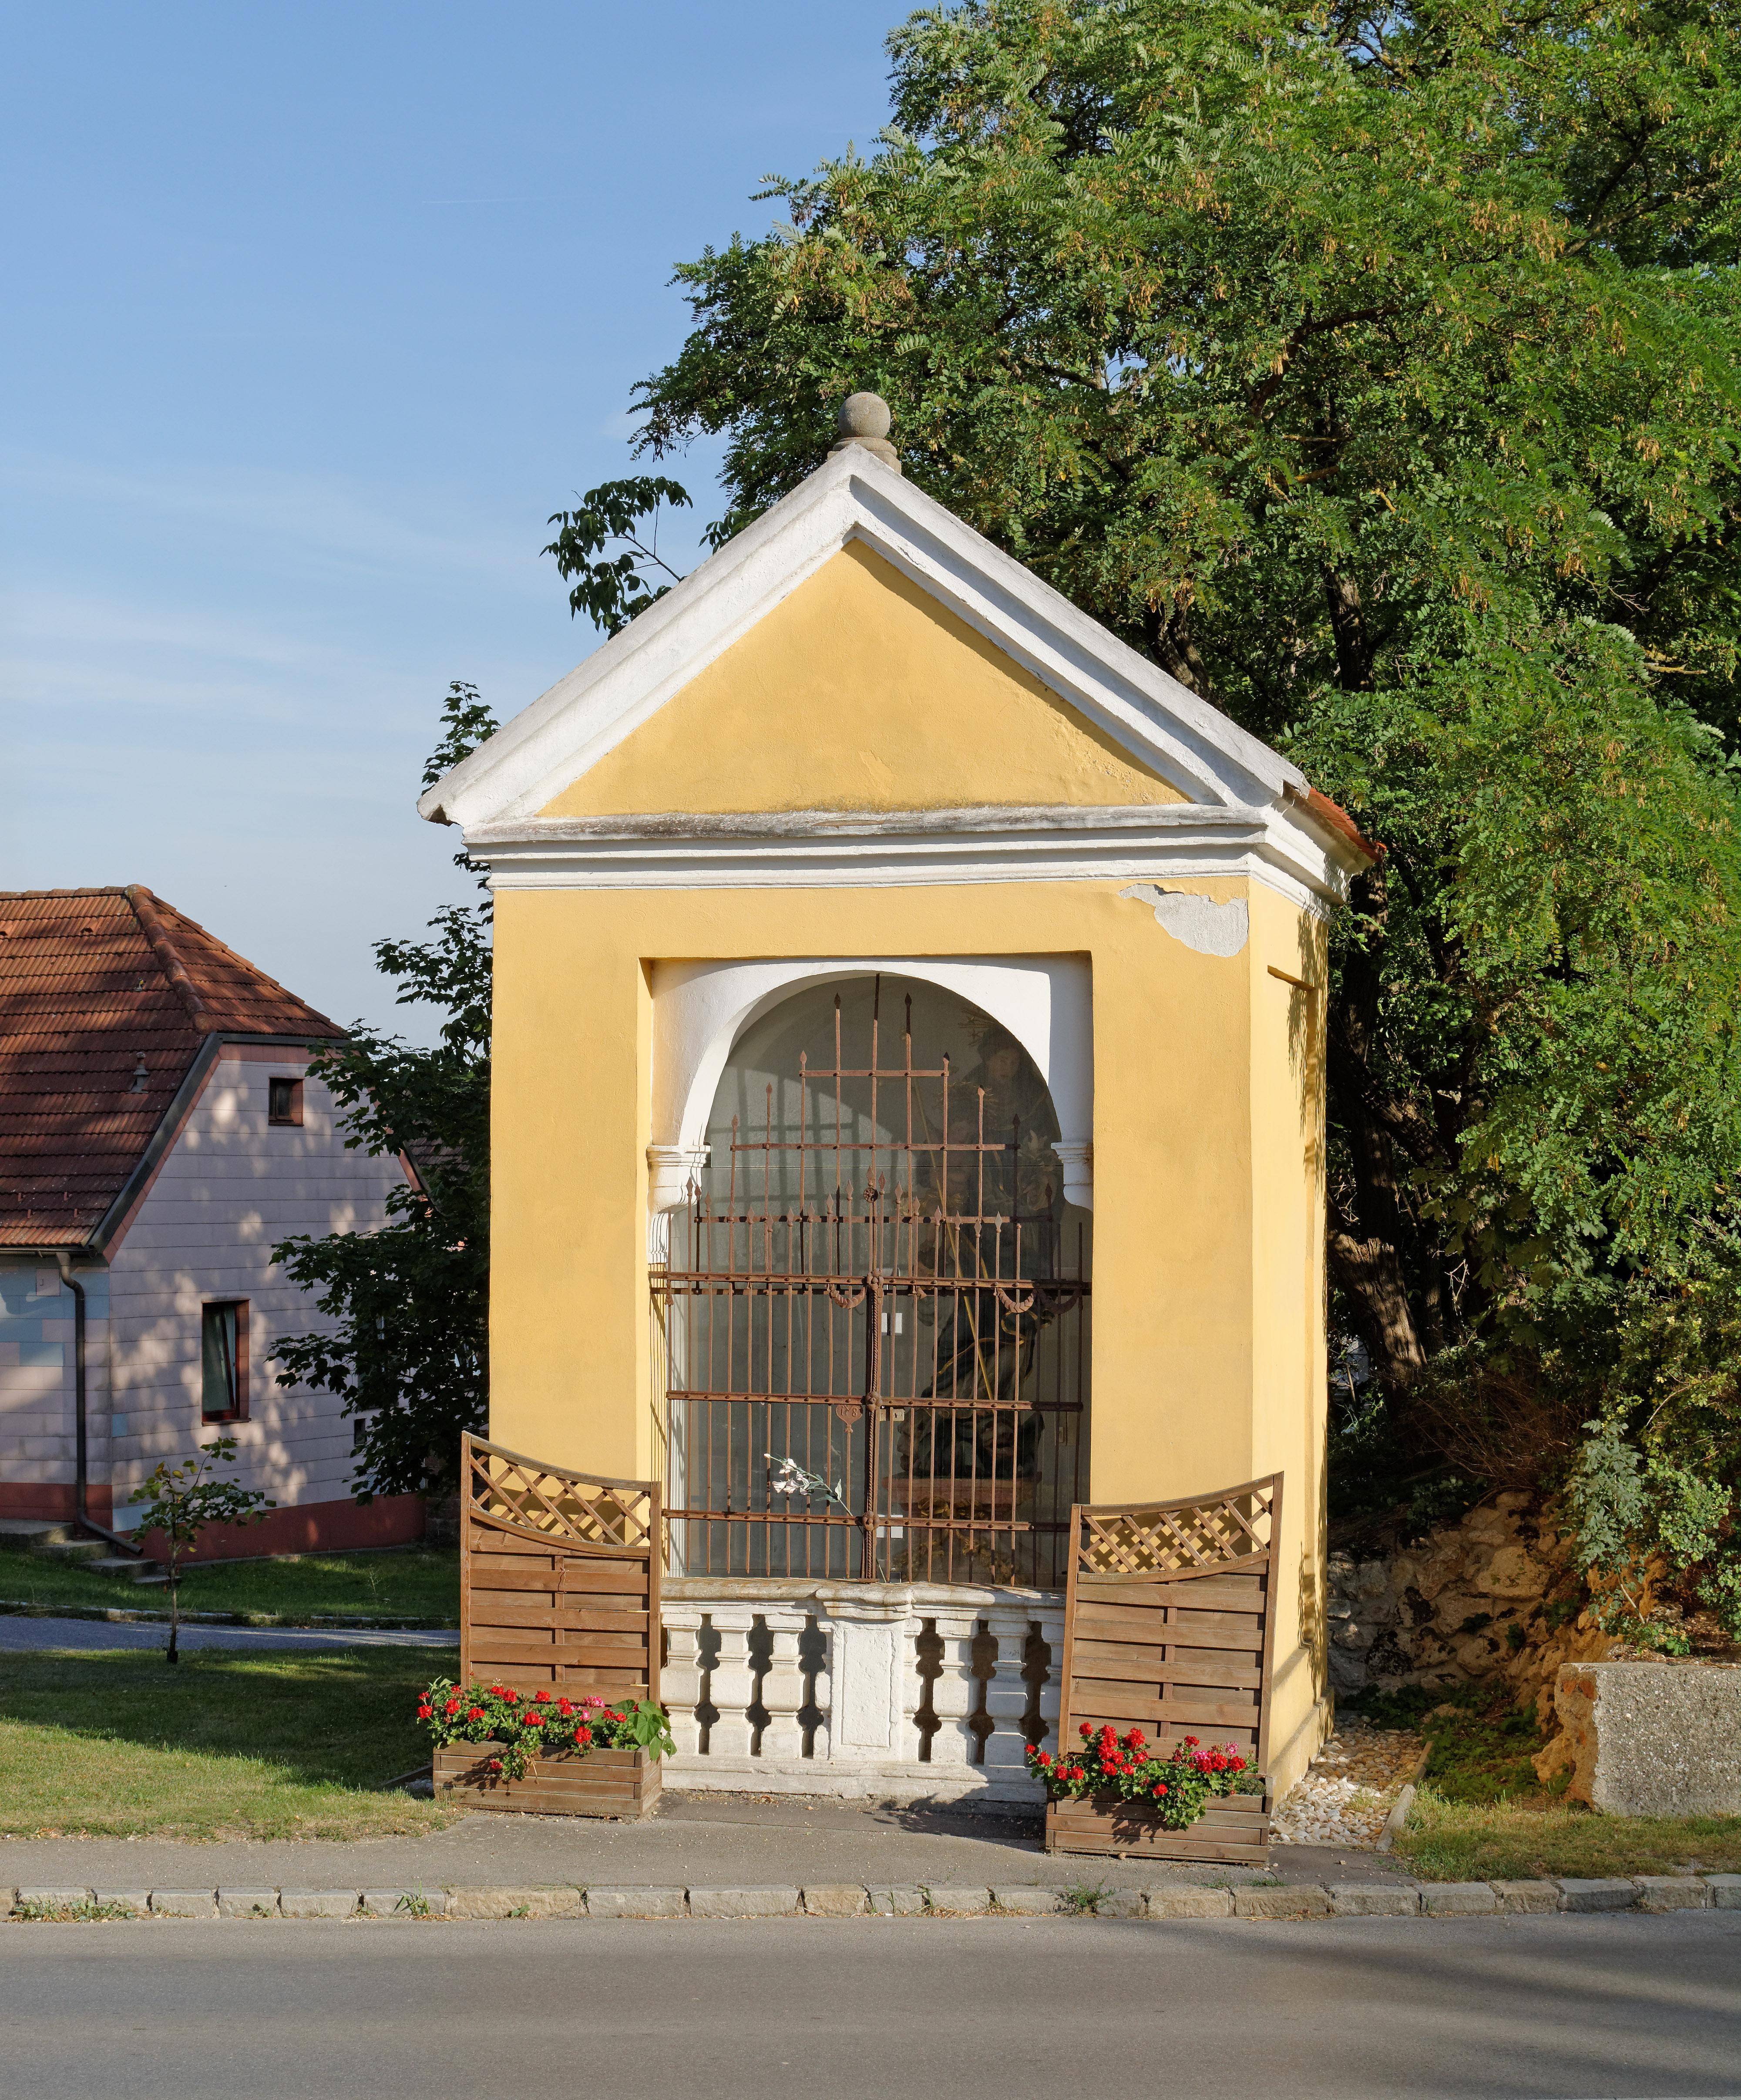 Schweinberger Irene u. Martin - Wilfersdorf - RiS-Kommunal